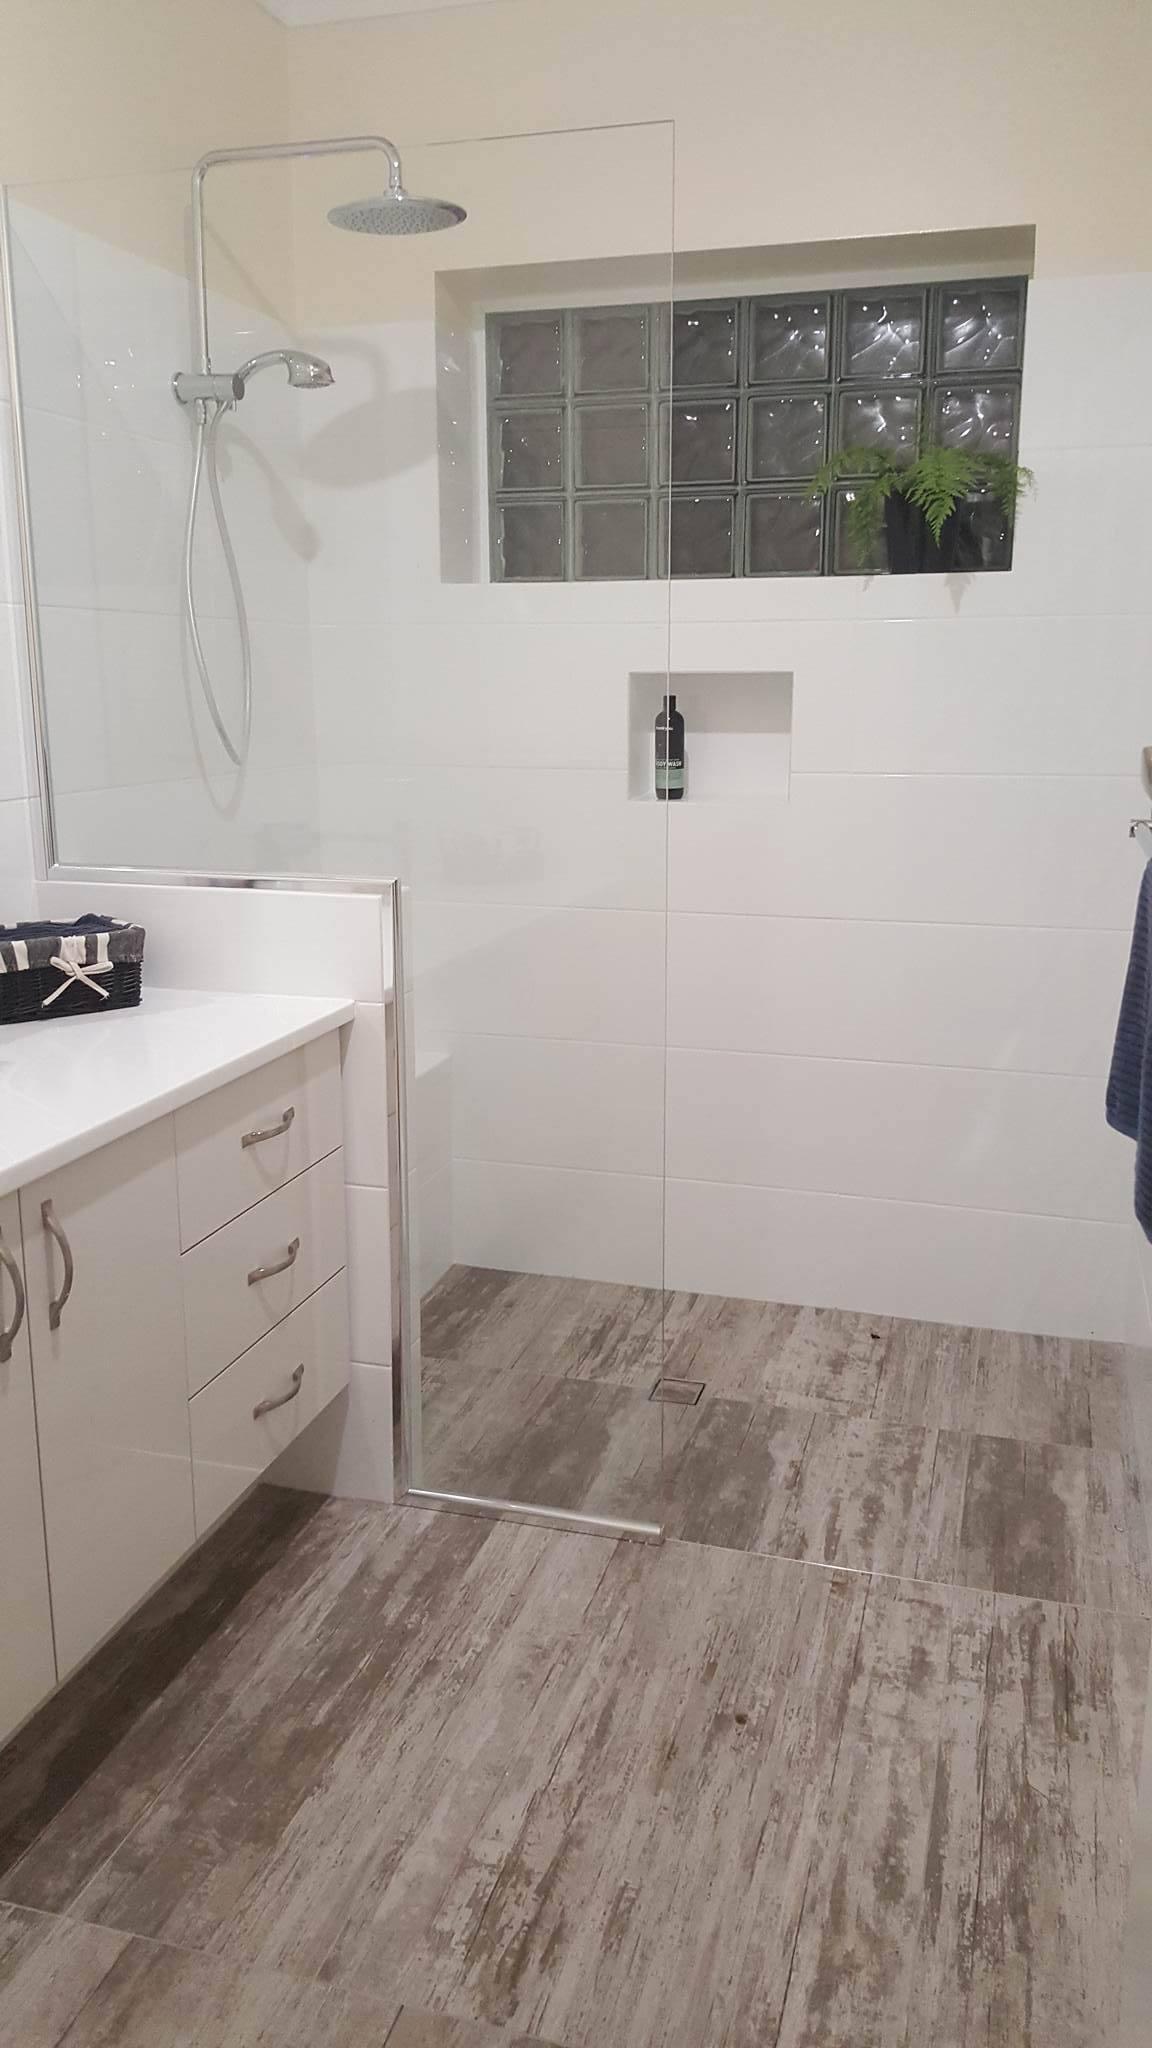 Revive Renovation Specialists - Bathroom Renovations & Designs ...